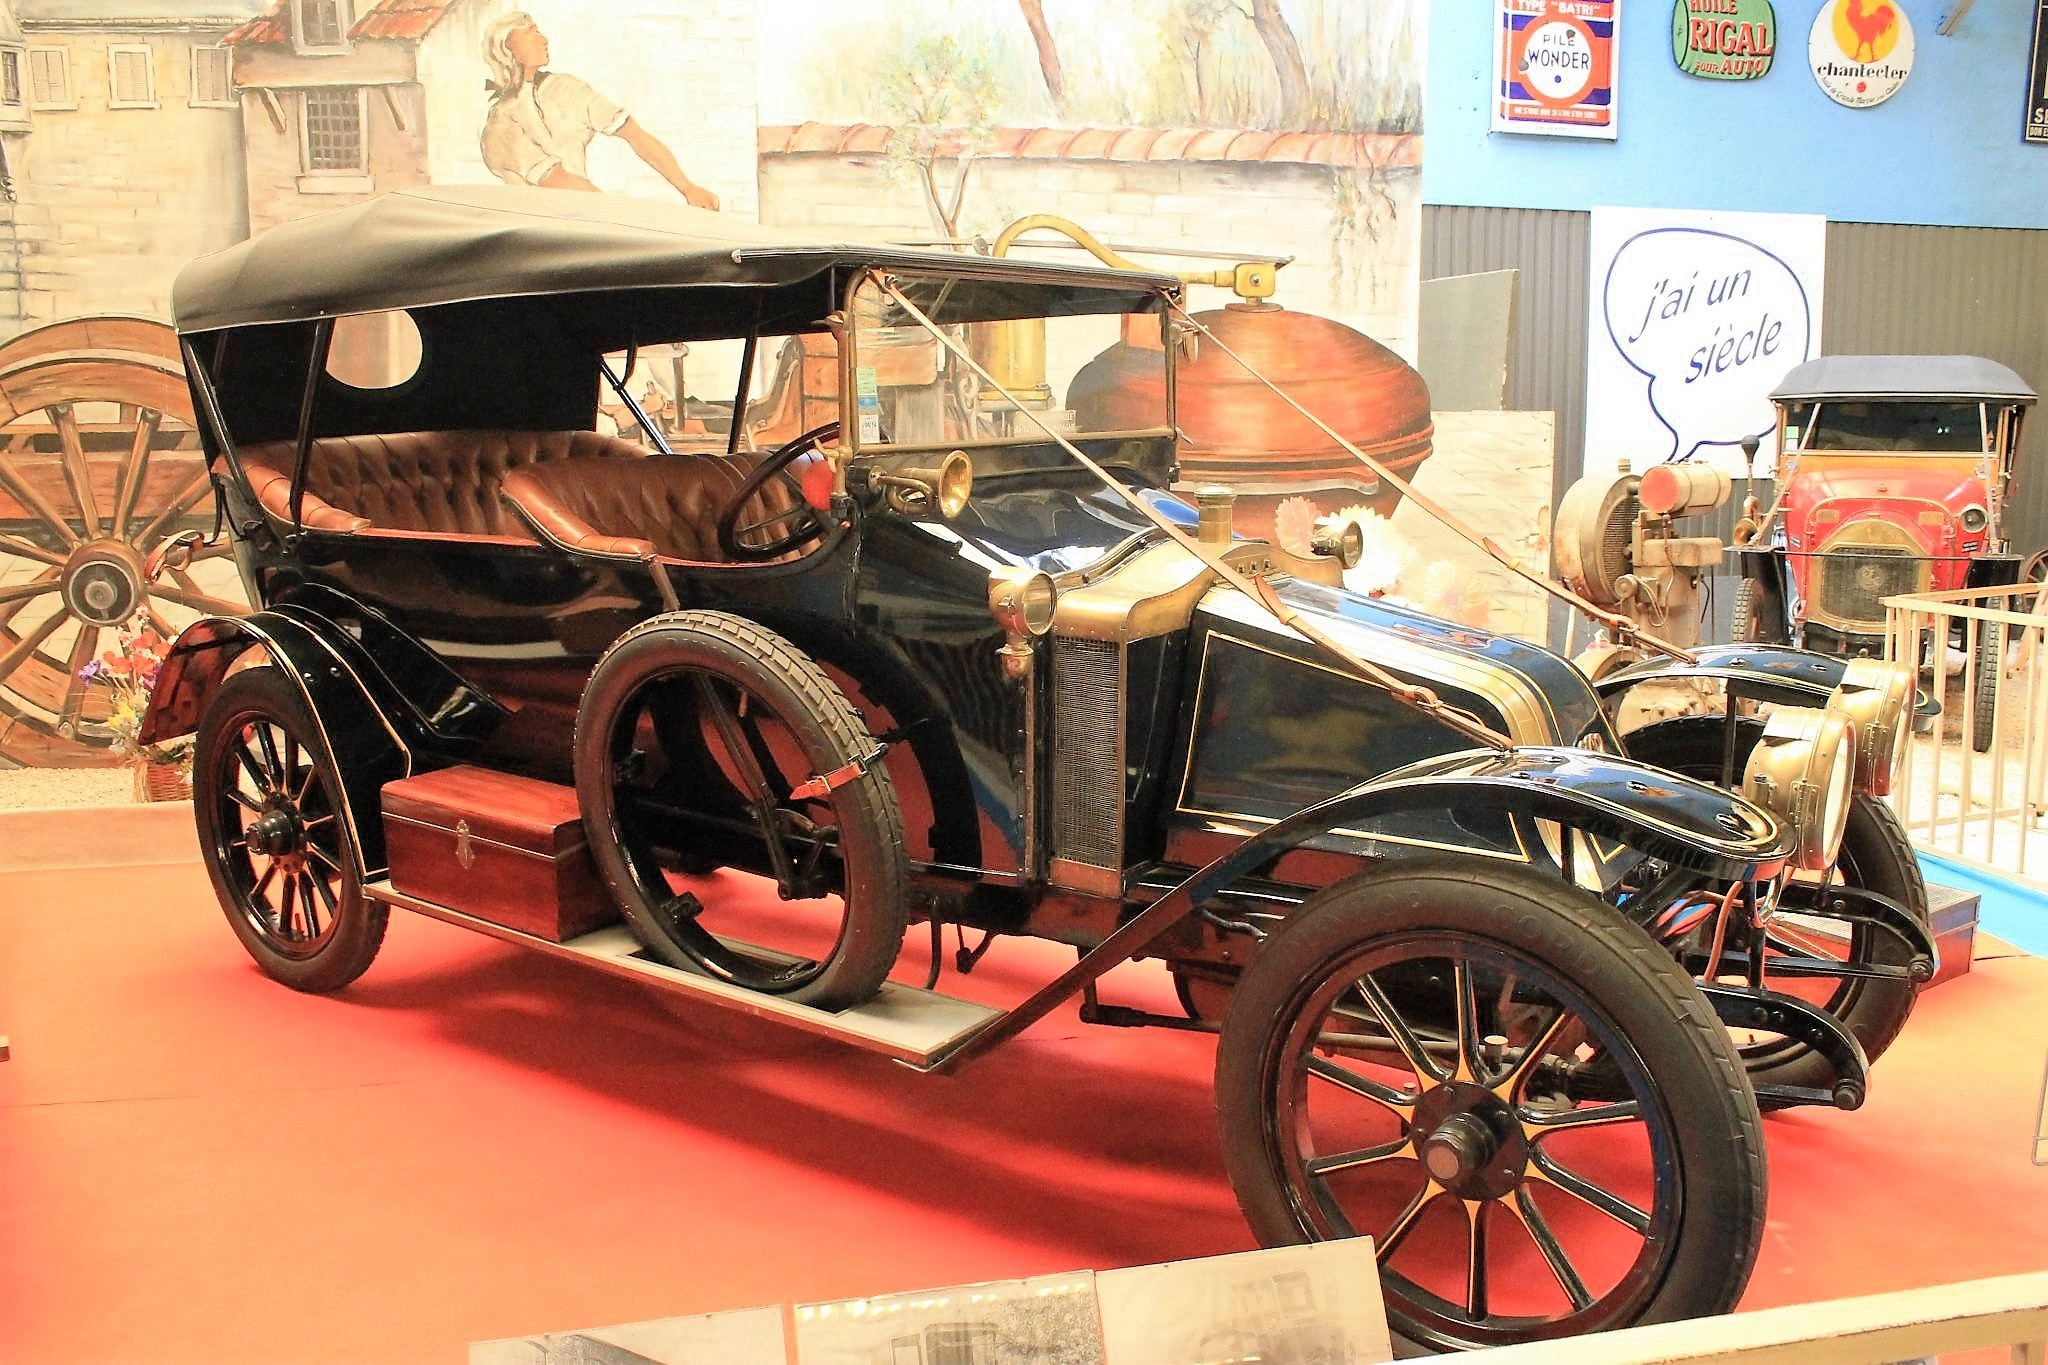 Musée Automobiles de Reims 1908 scar torpedo